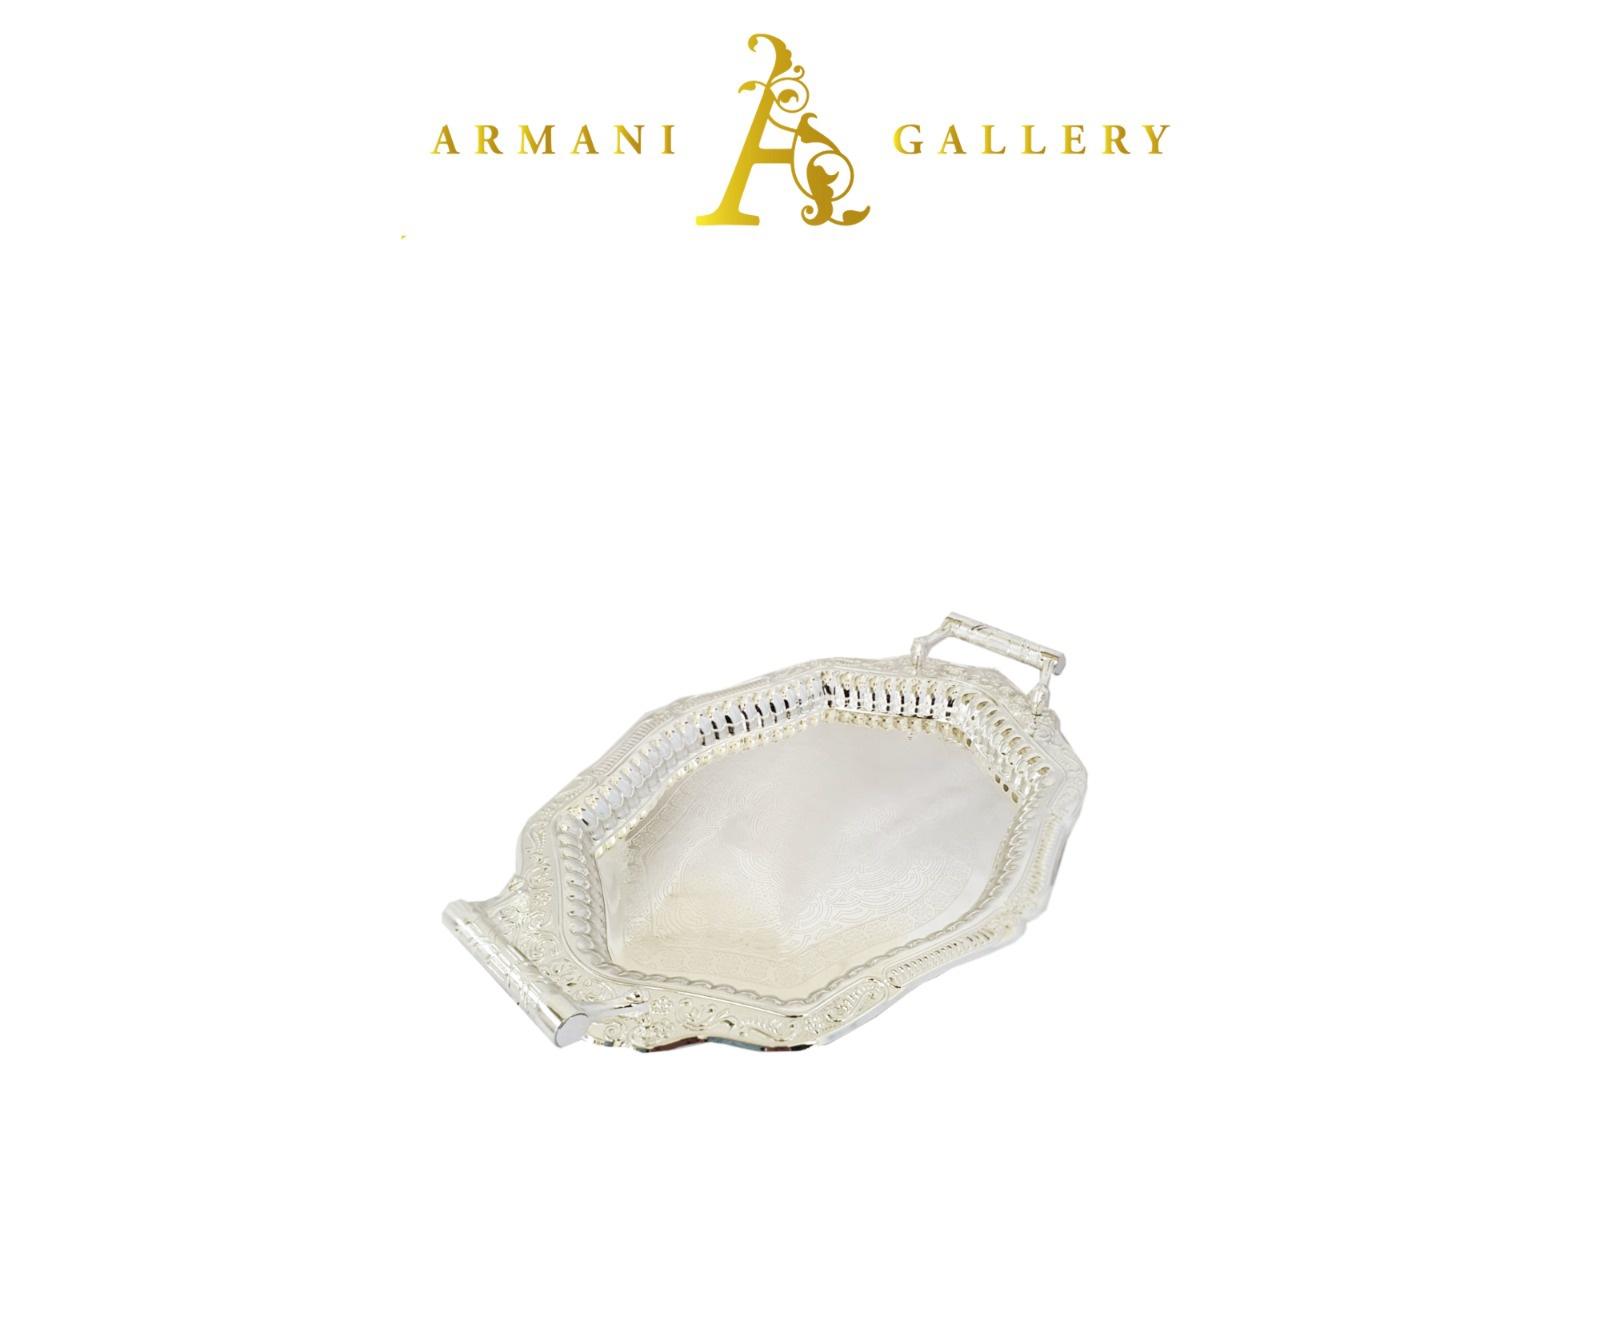 Buy Turkish Diamond Silver Serving Tray